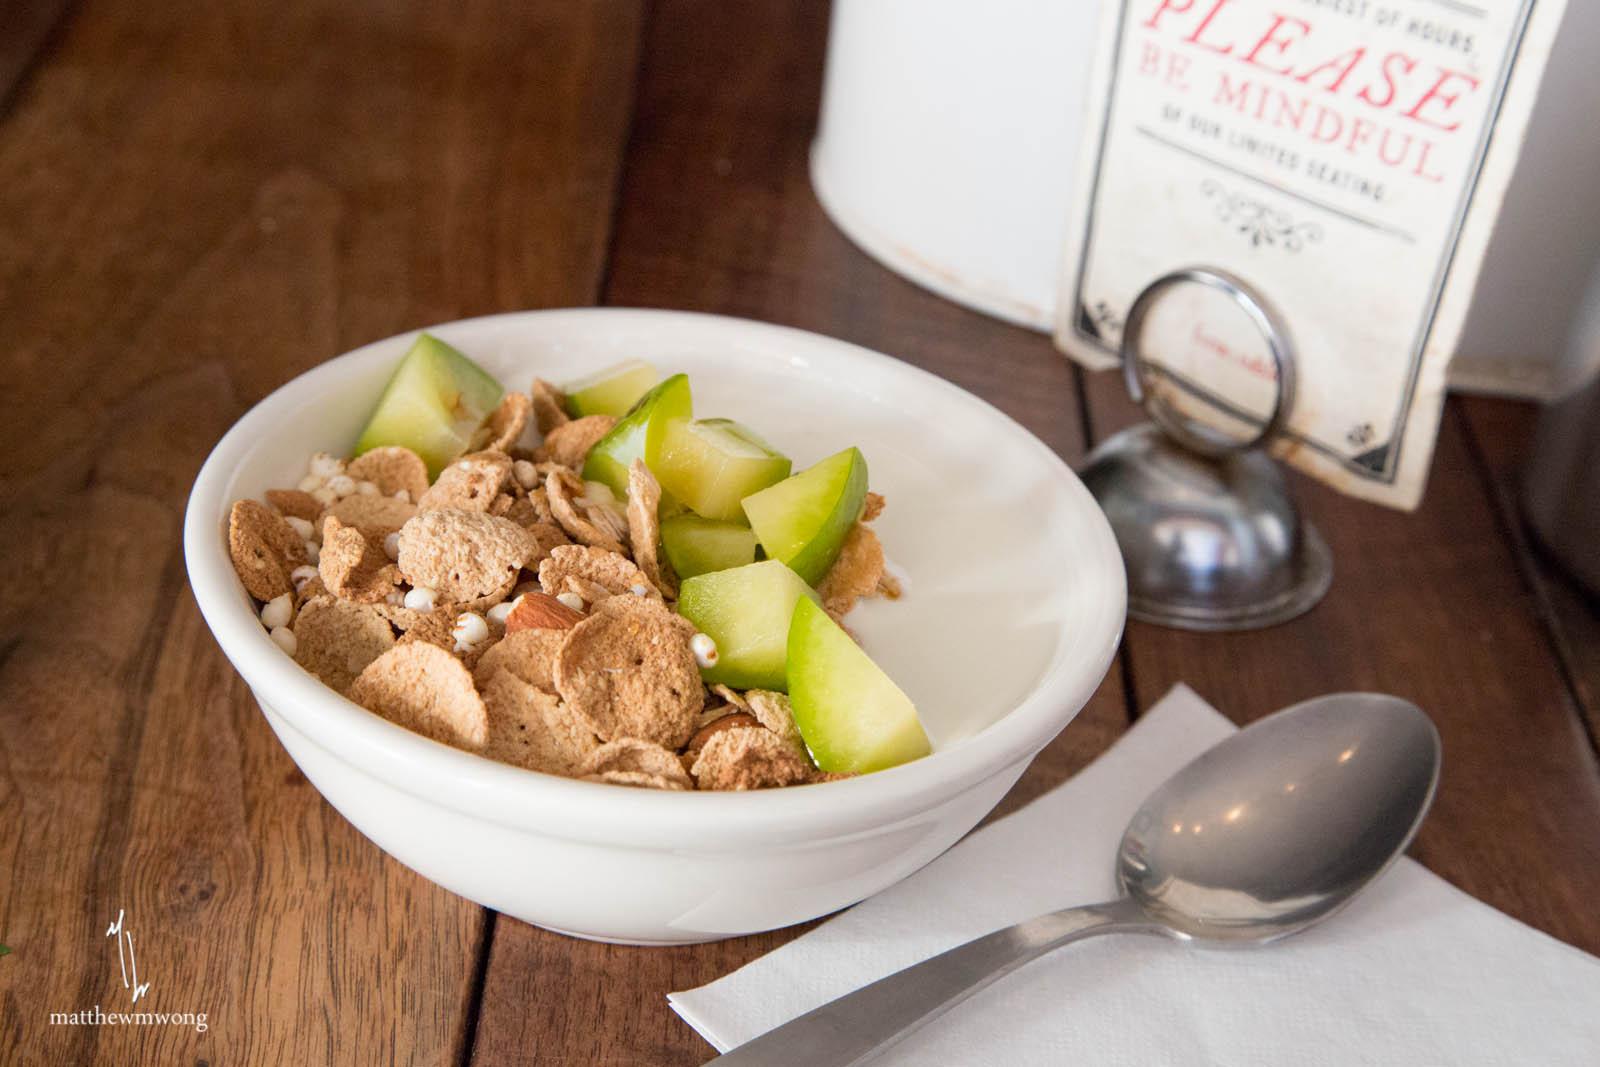 House Made Cereal - Creamy Yogurt, Honey, Fruit OTD